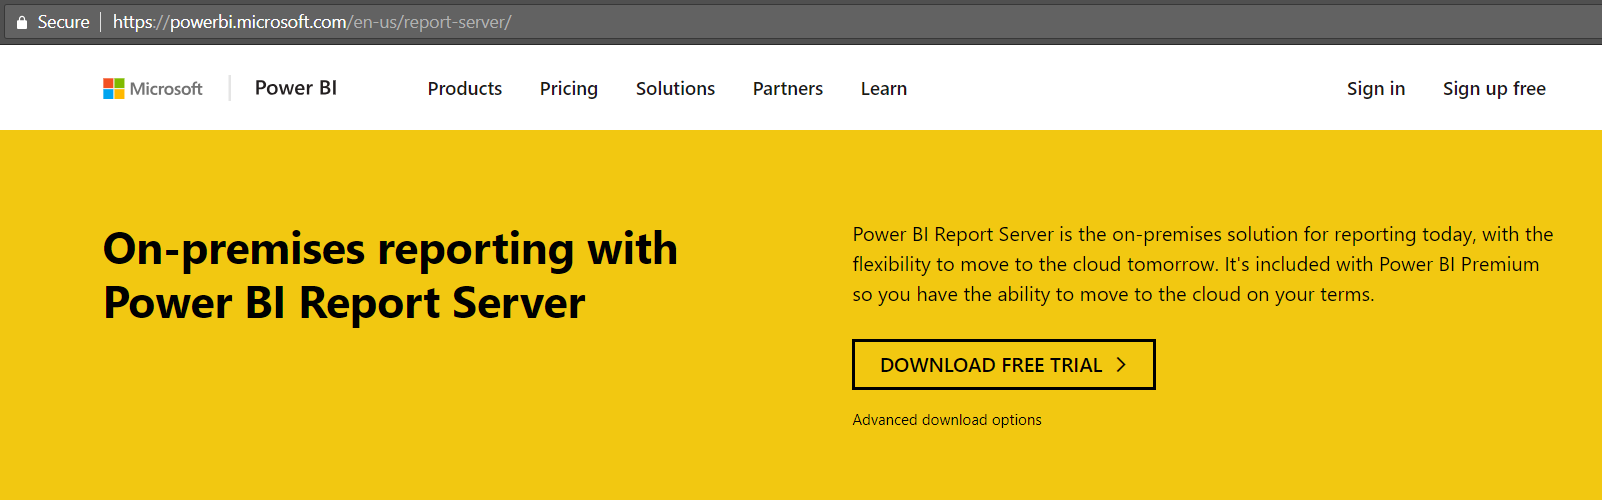 Installing Power BI Report Server - Carl de Souza